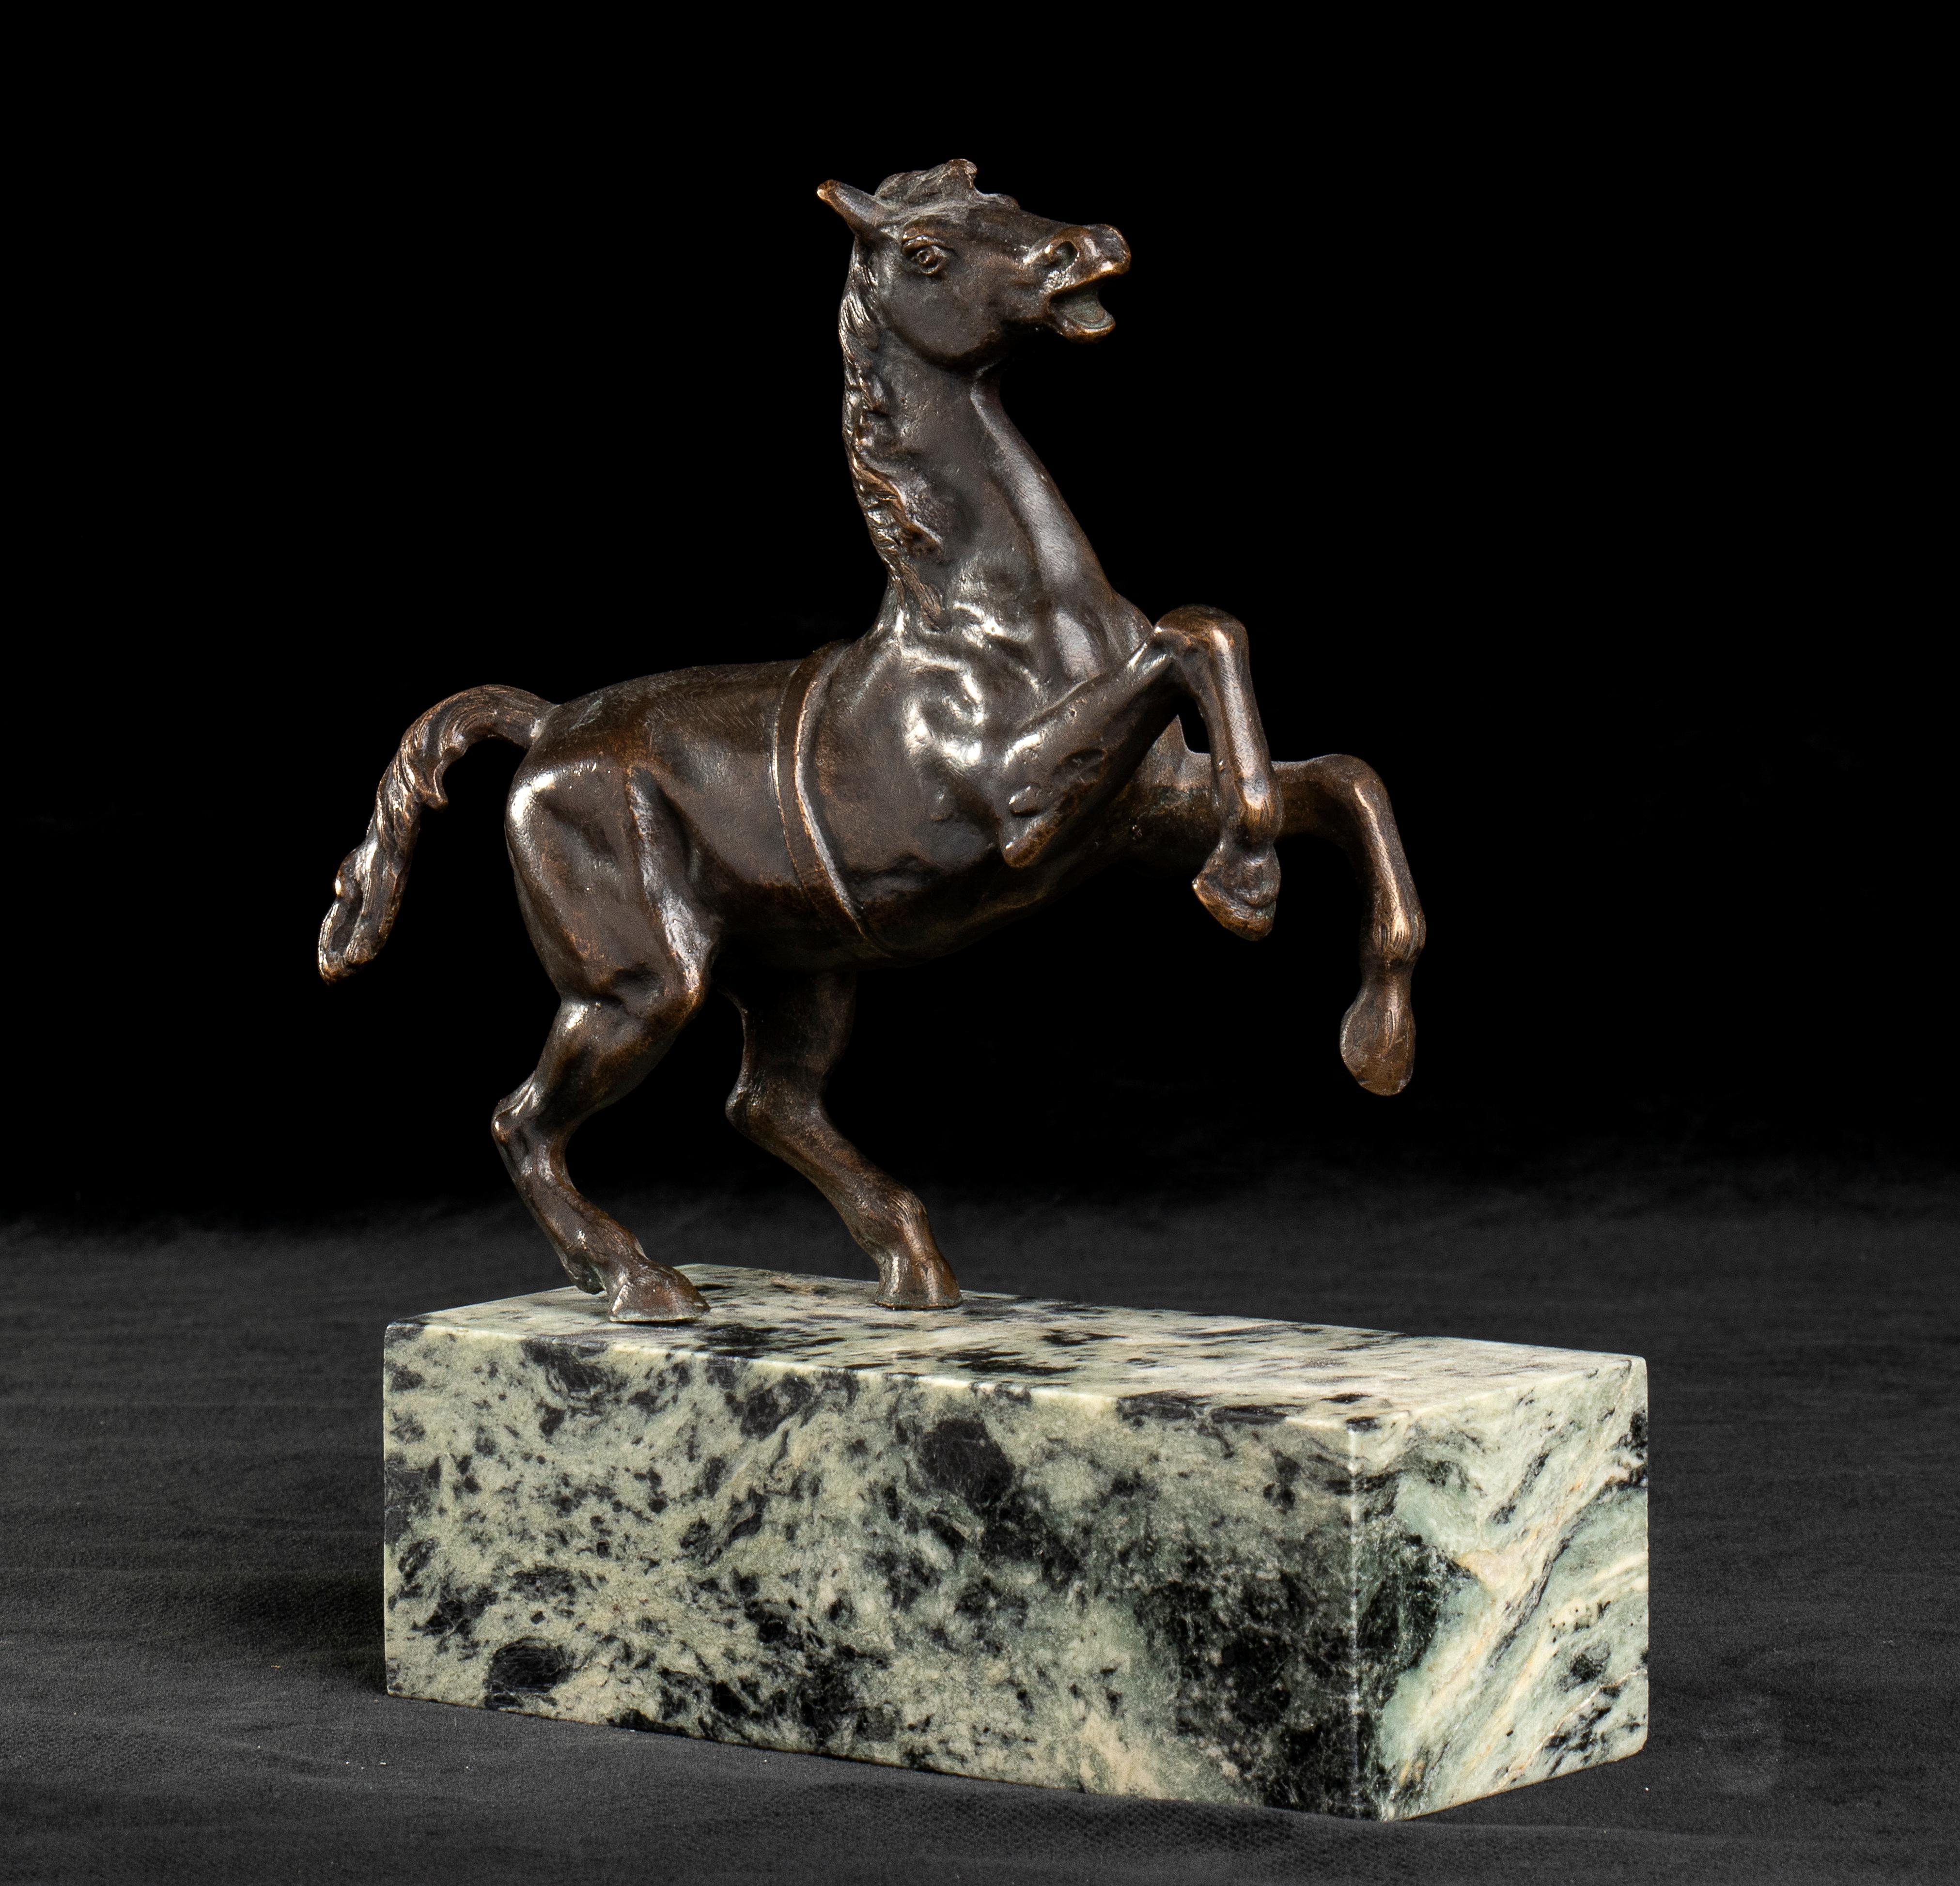 Grand Tour Bronze Sculpture of Rampant Horse Standing on Specimen Marble Base